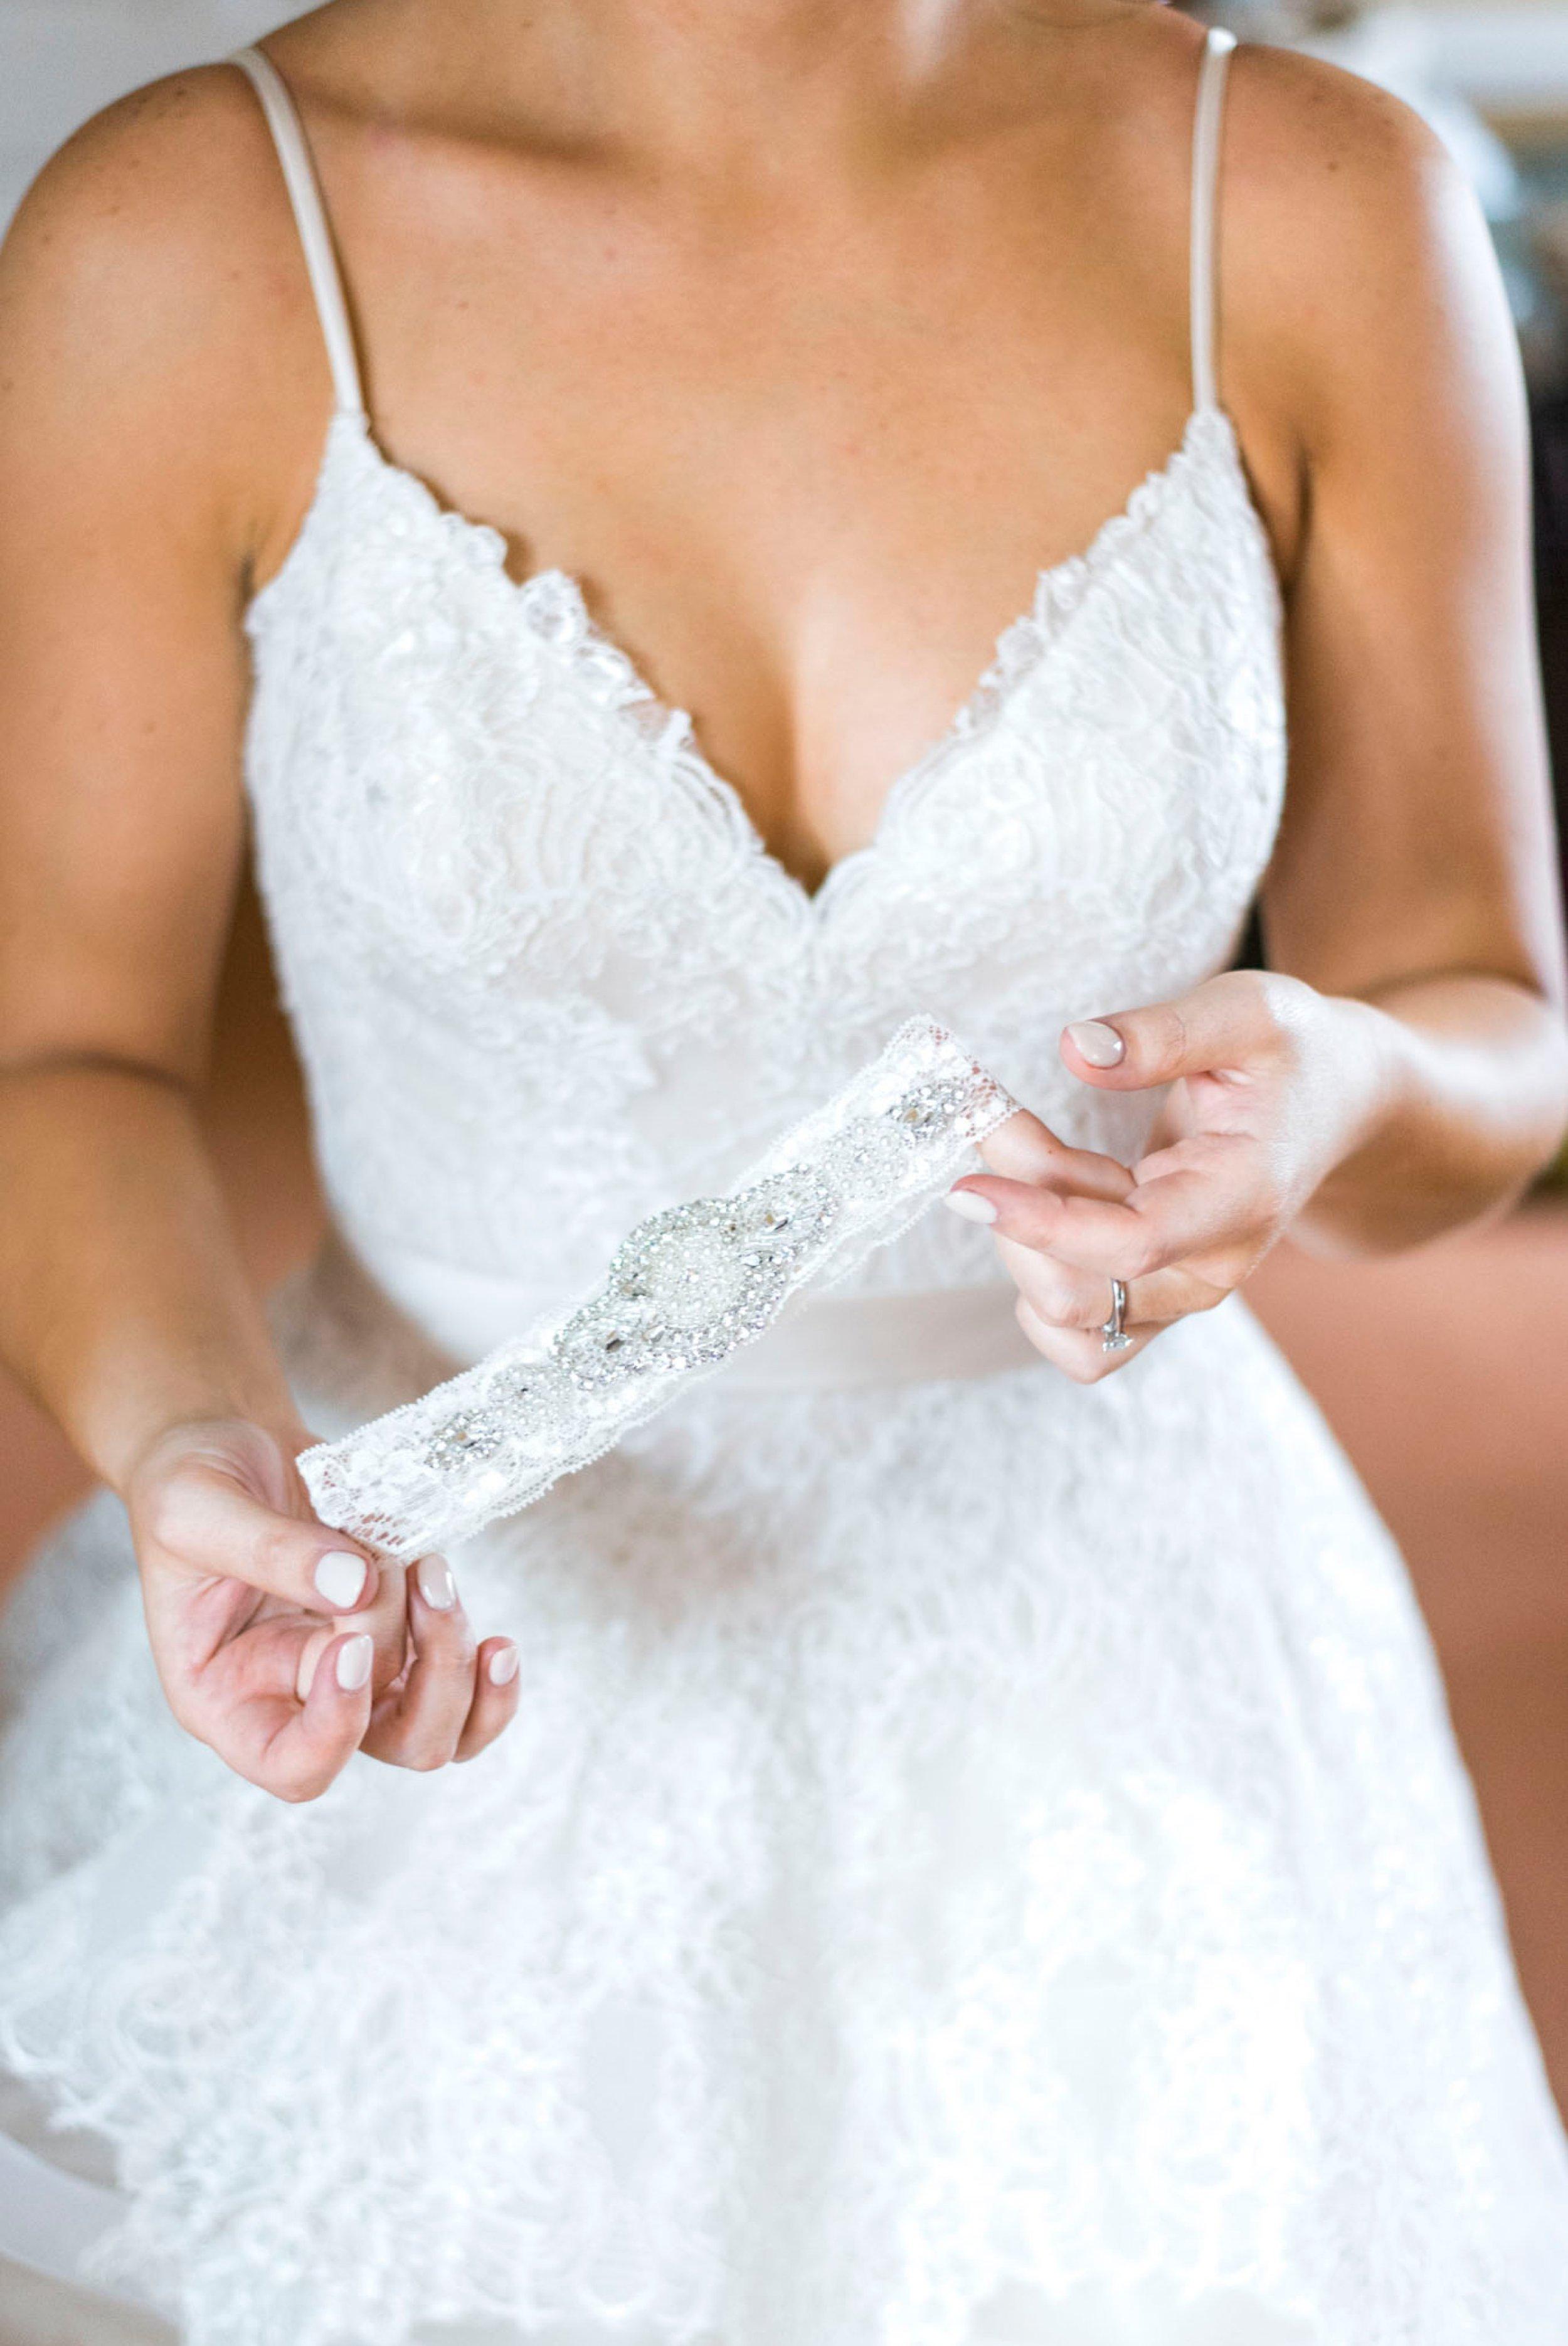 IrvineEstate_LexingtonVA_Wedding_FallWedding_VirginiaWeddingPhotographer 14.jpg